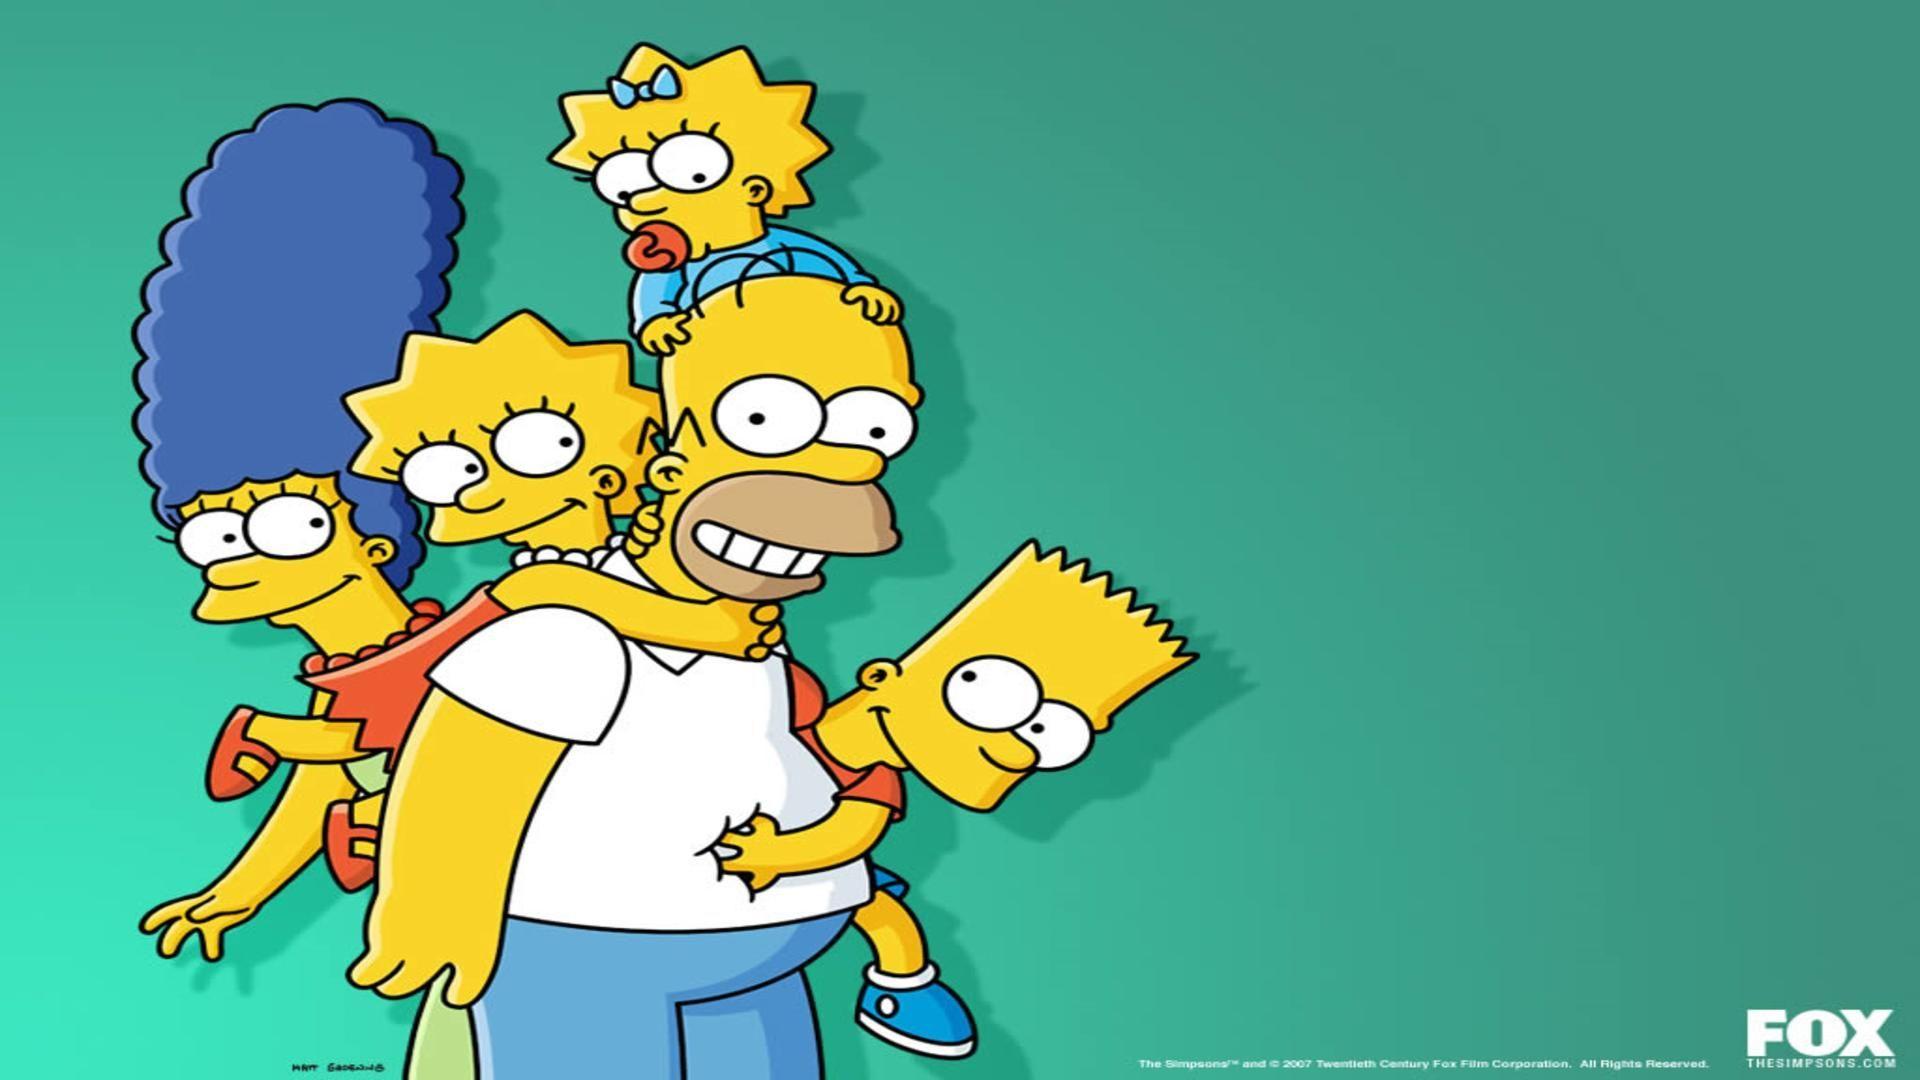 Download Cute Tweety Wallpapers The Simpsons Full Hd Wallpaper Wallpaper High